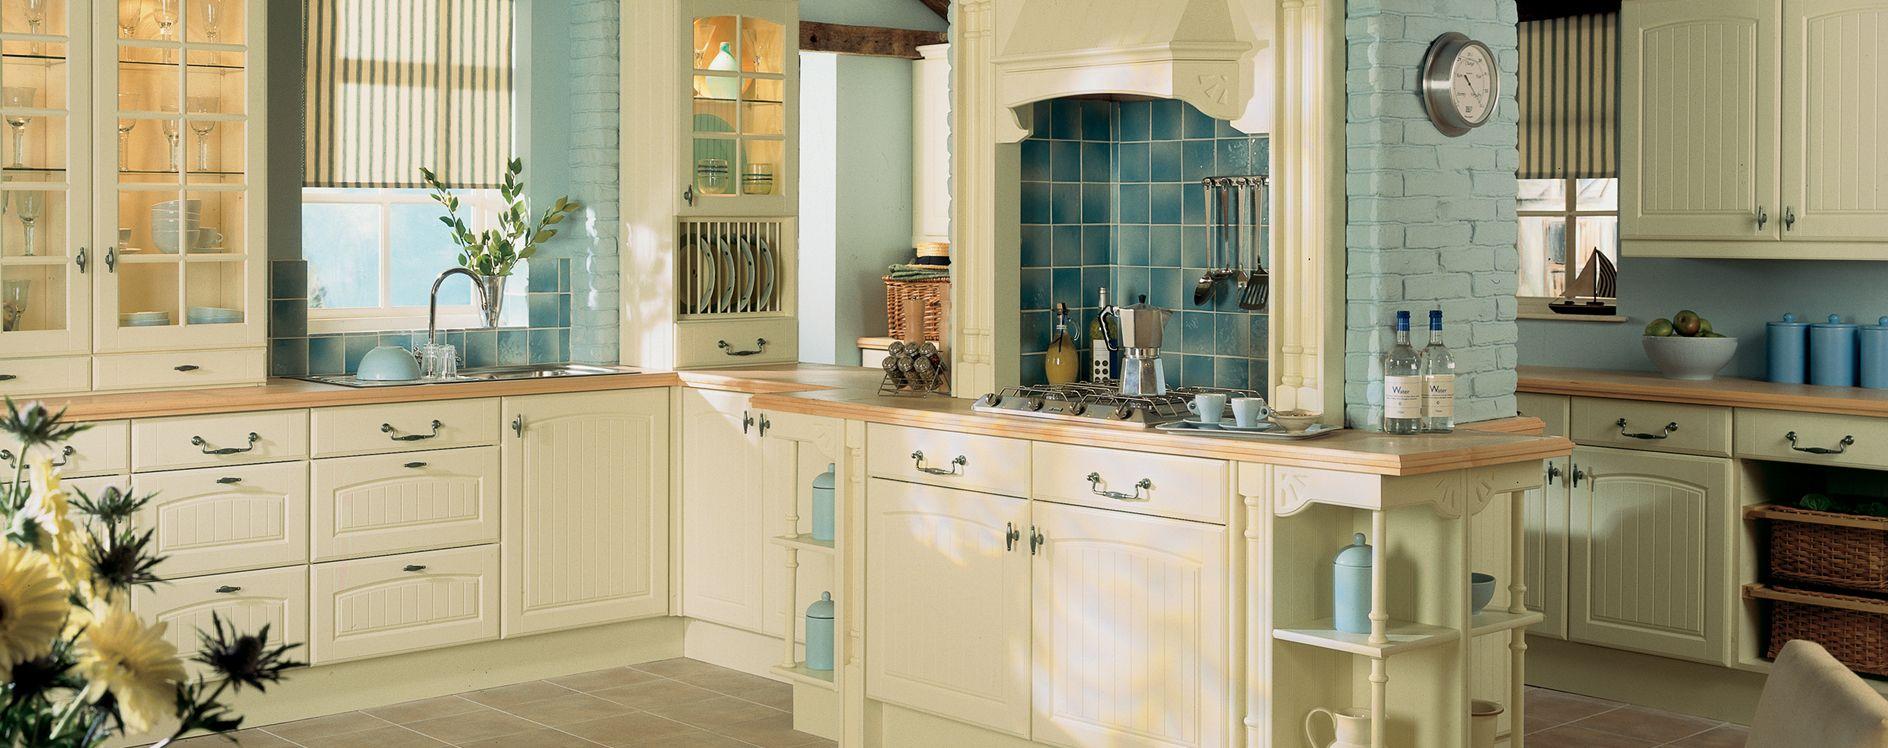 Burbidge Cambridge Alabaster Interiors No 2 Pinterest Kitchen